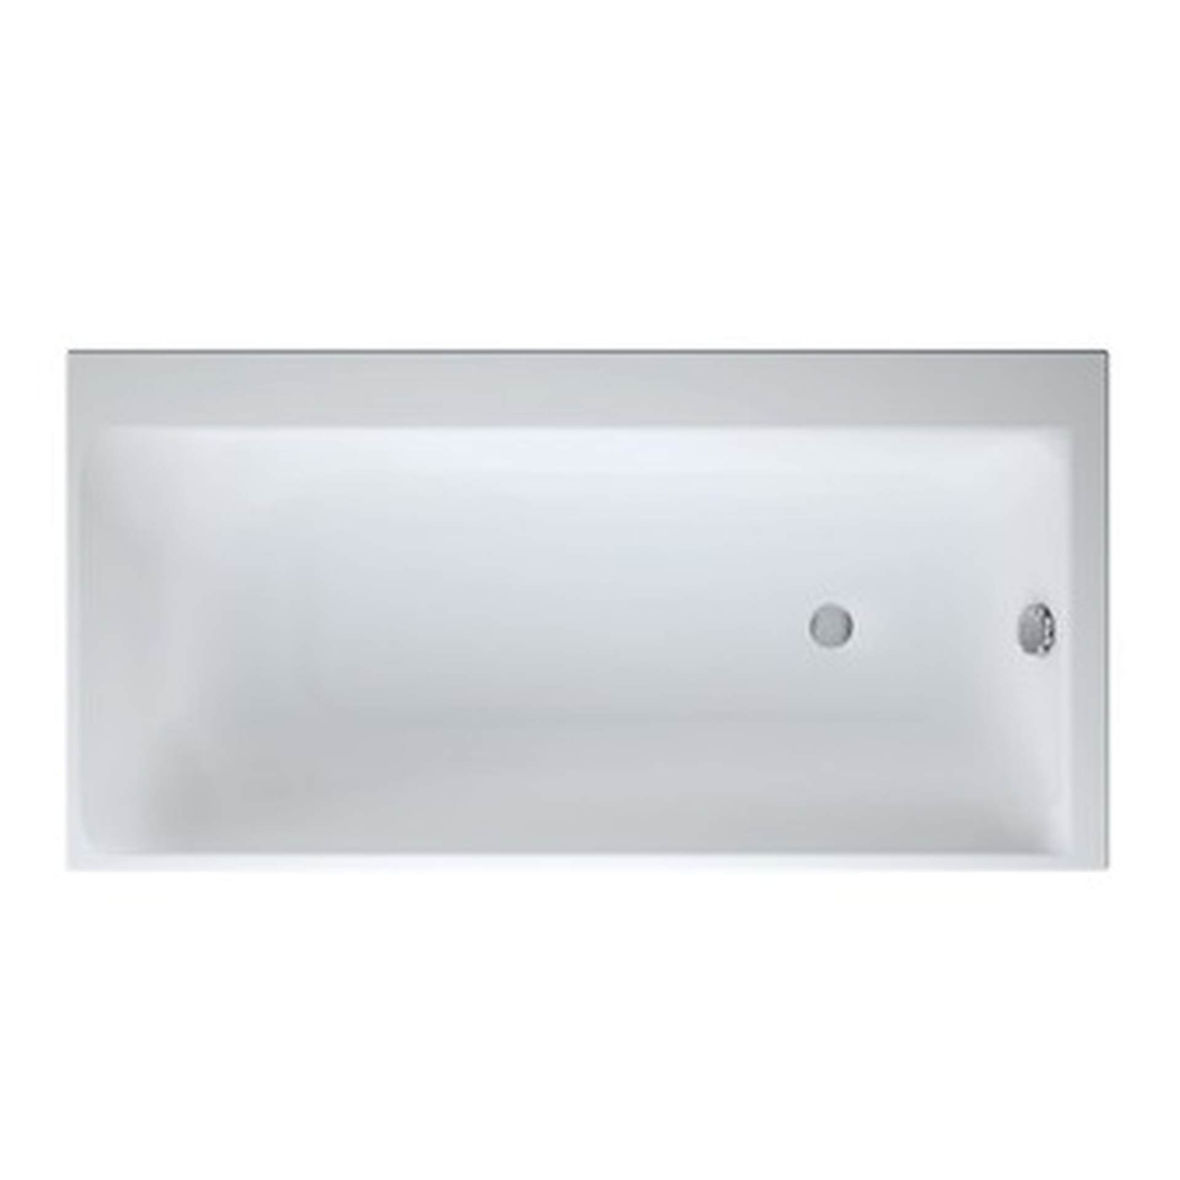 WAN PRO SMART P 160X80 CW S301-118